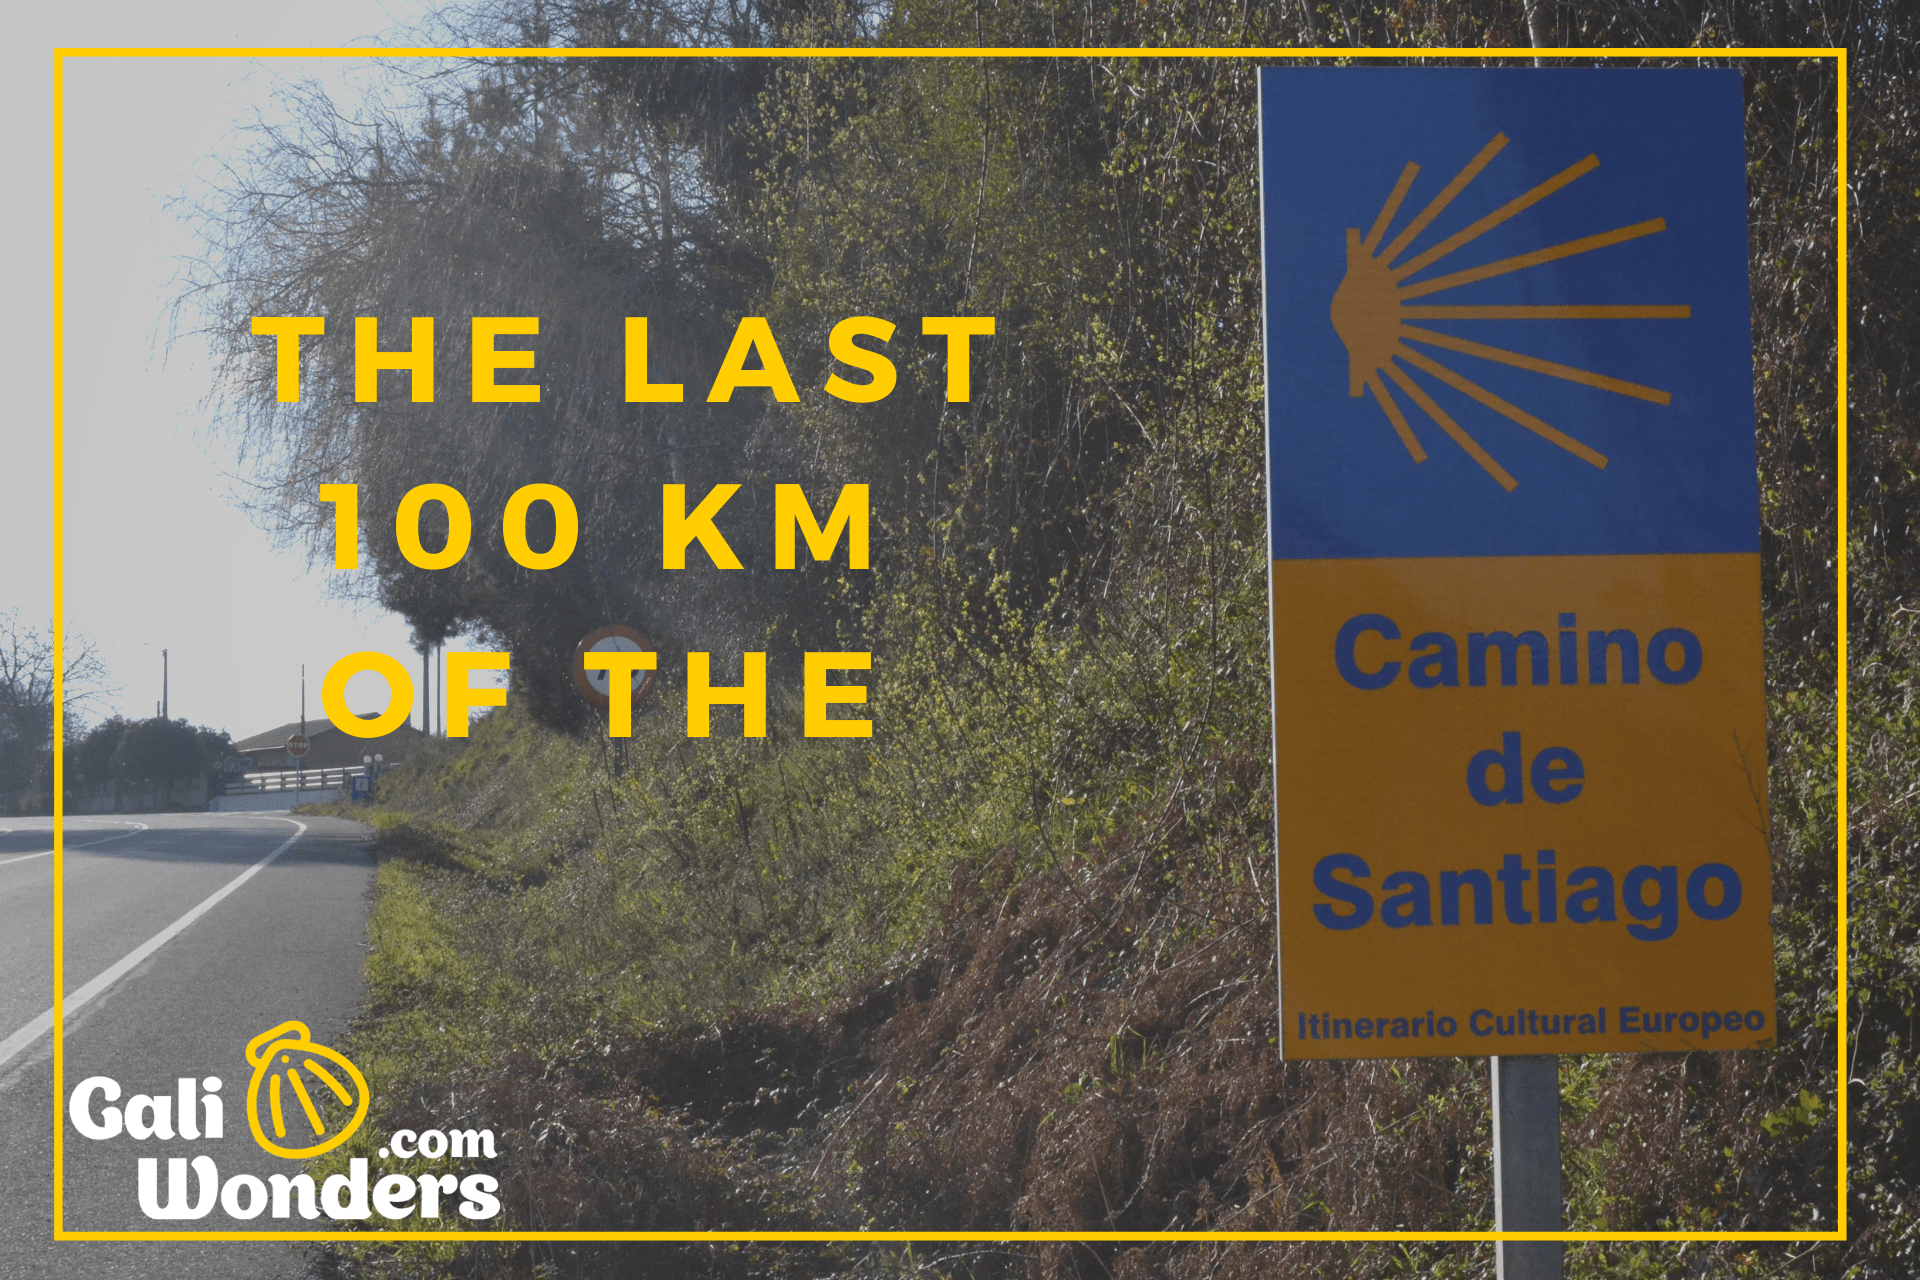 camino de santiago 100 km